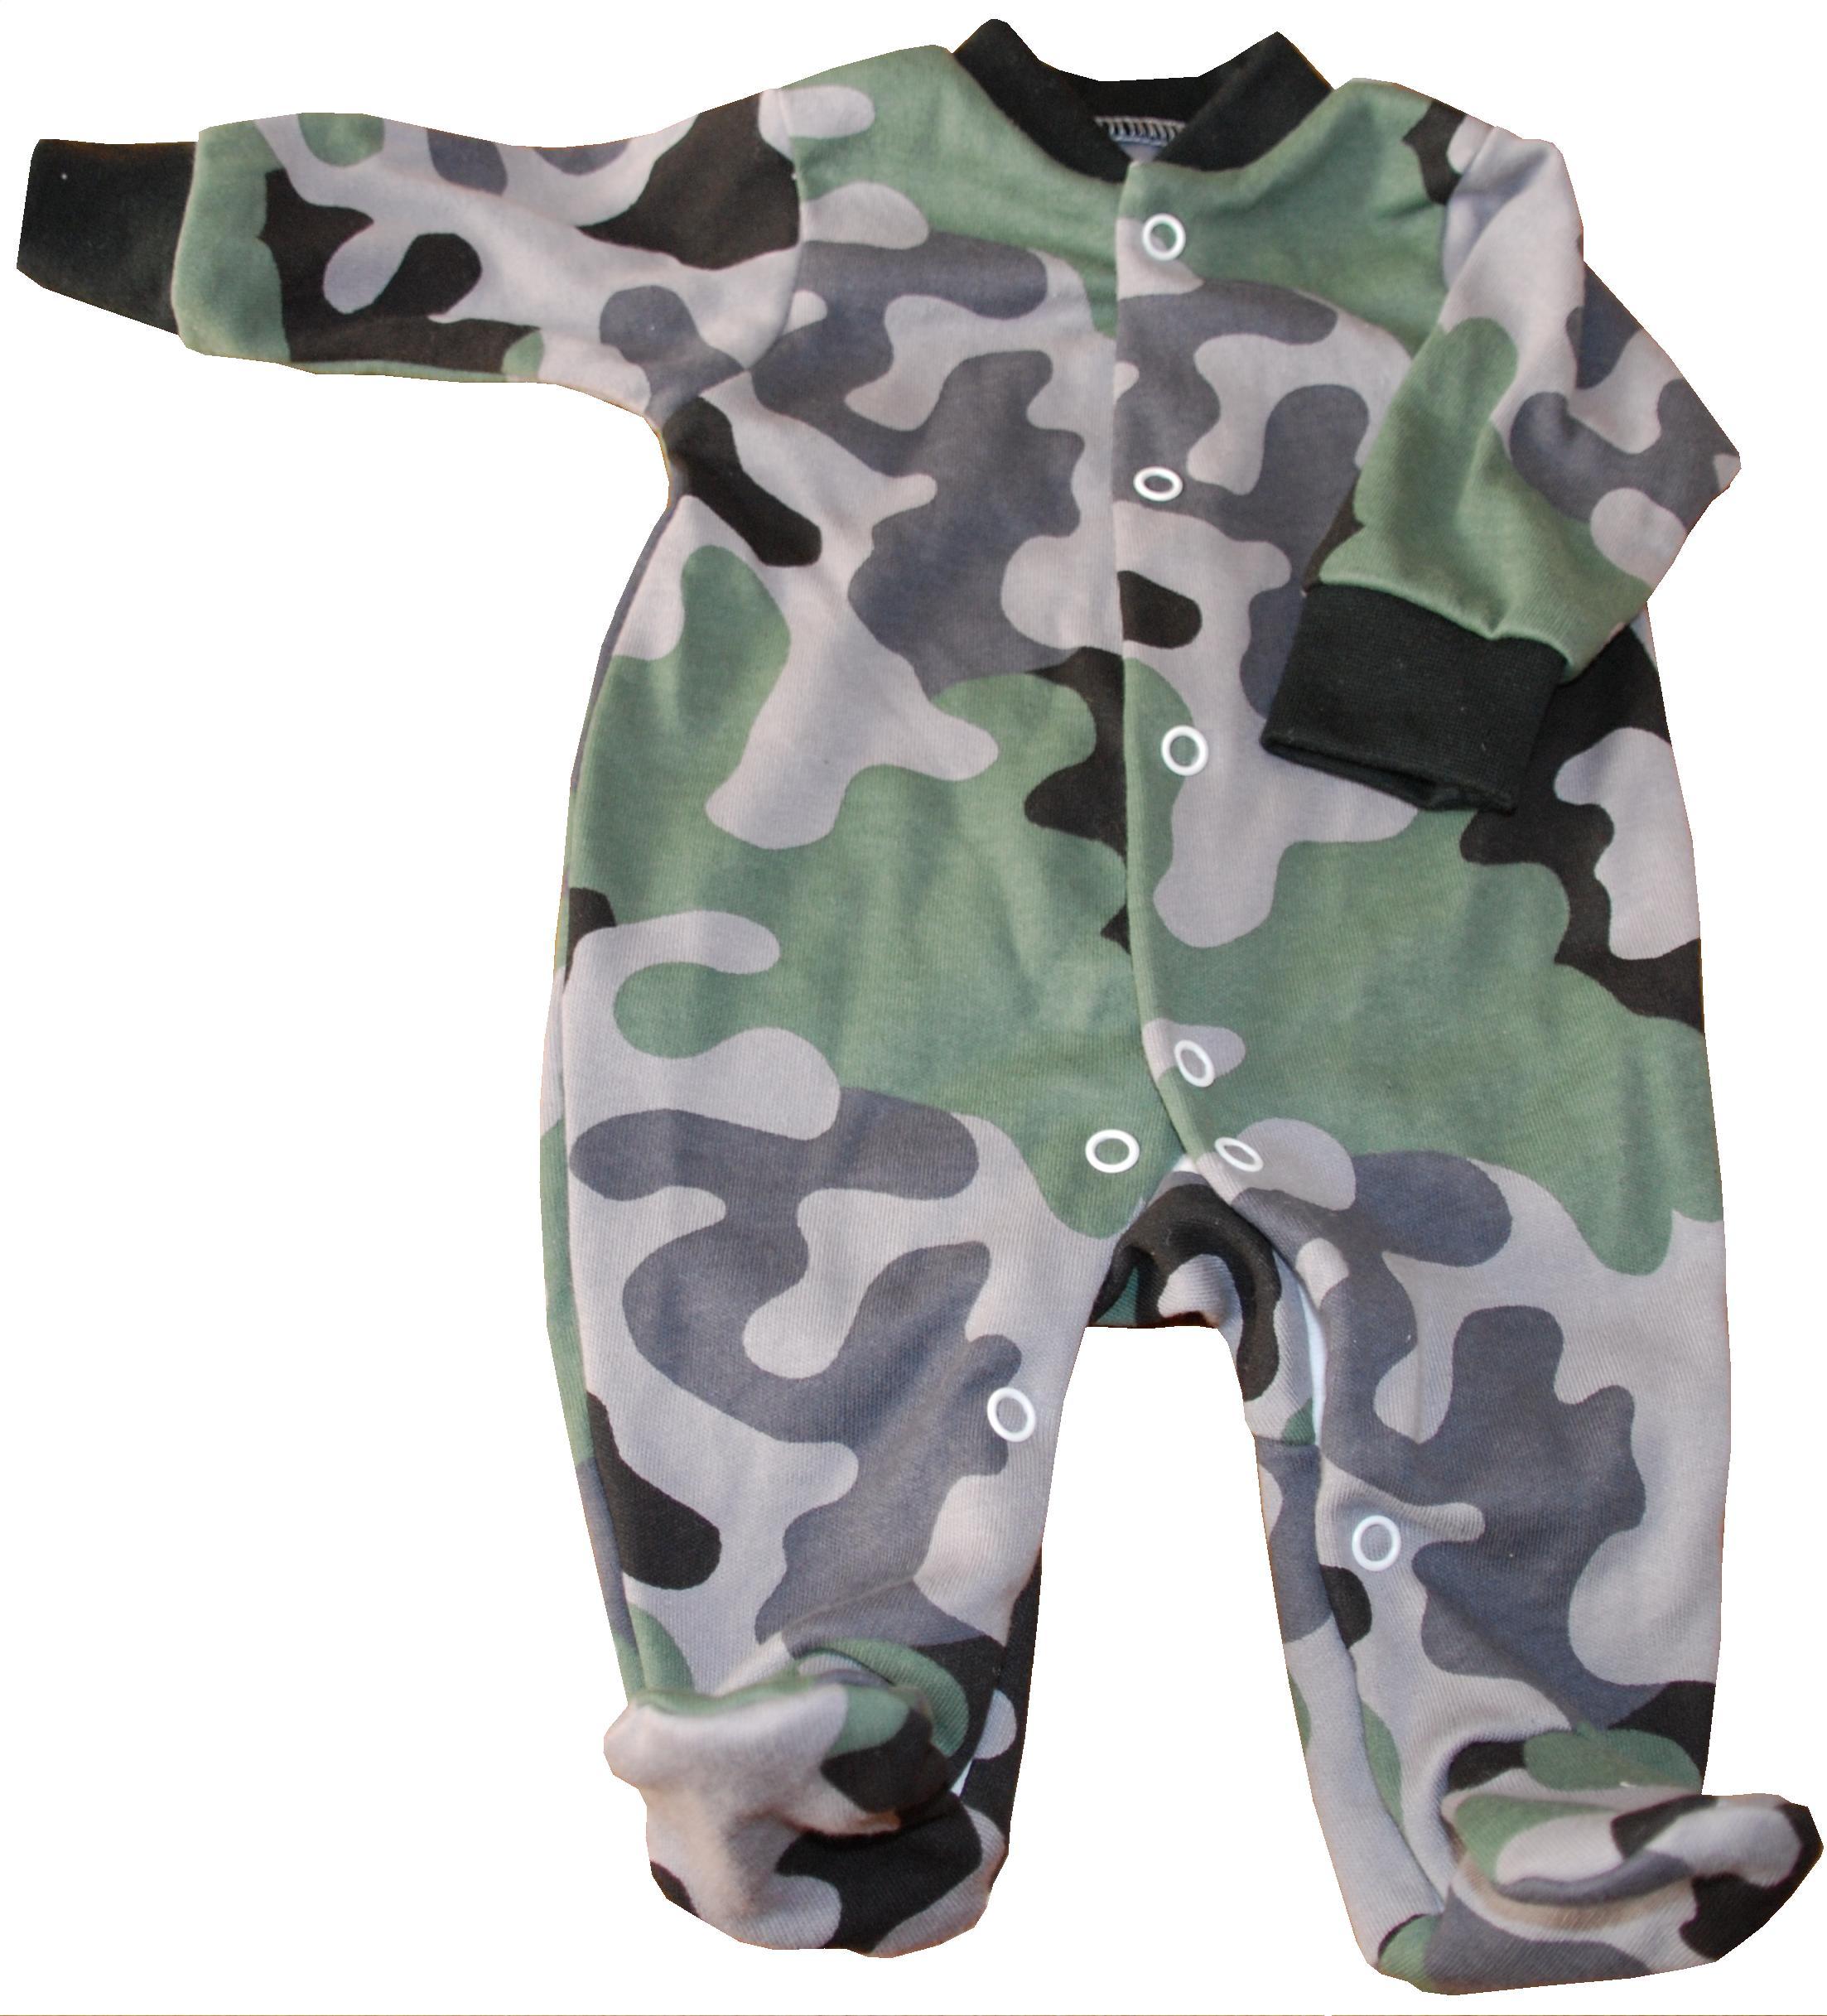 fb819ead9445 kojenecké army oblečení